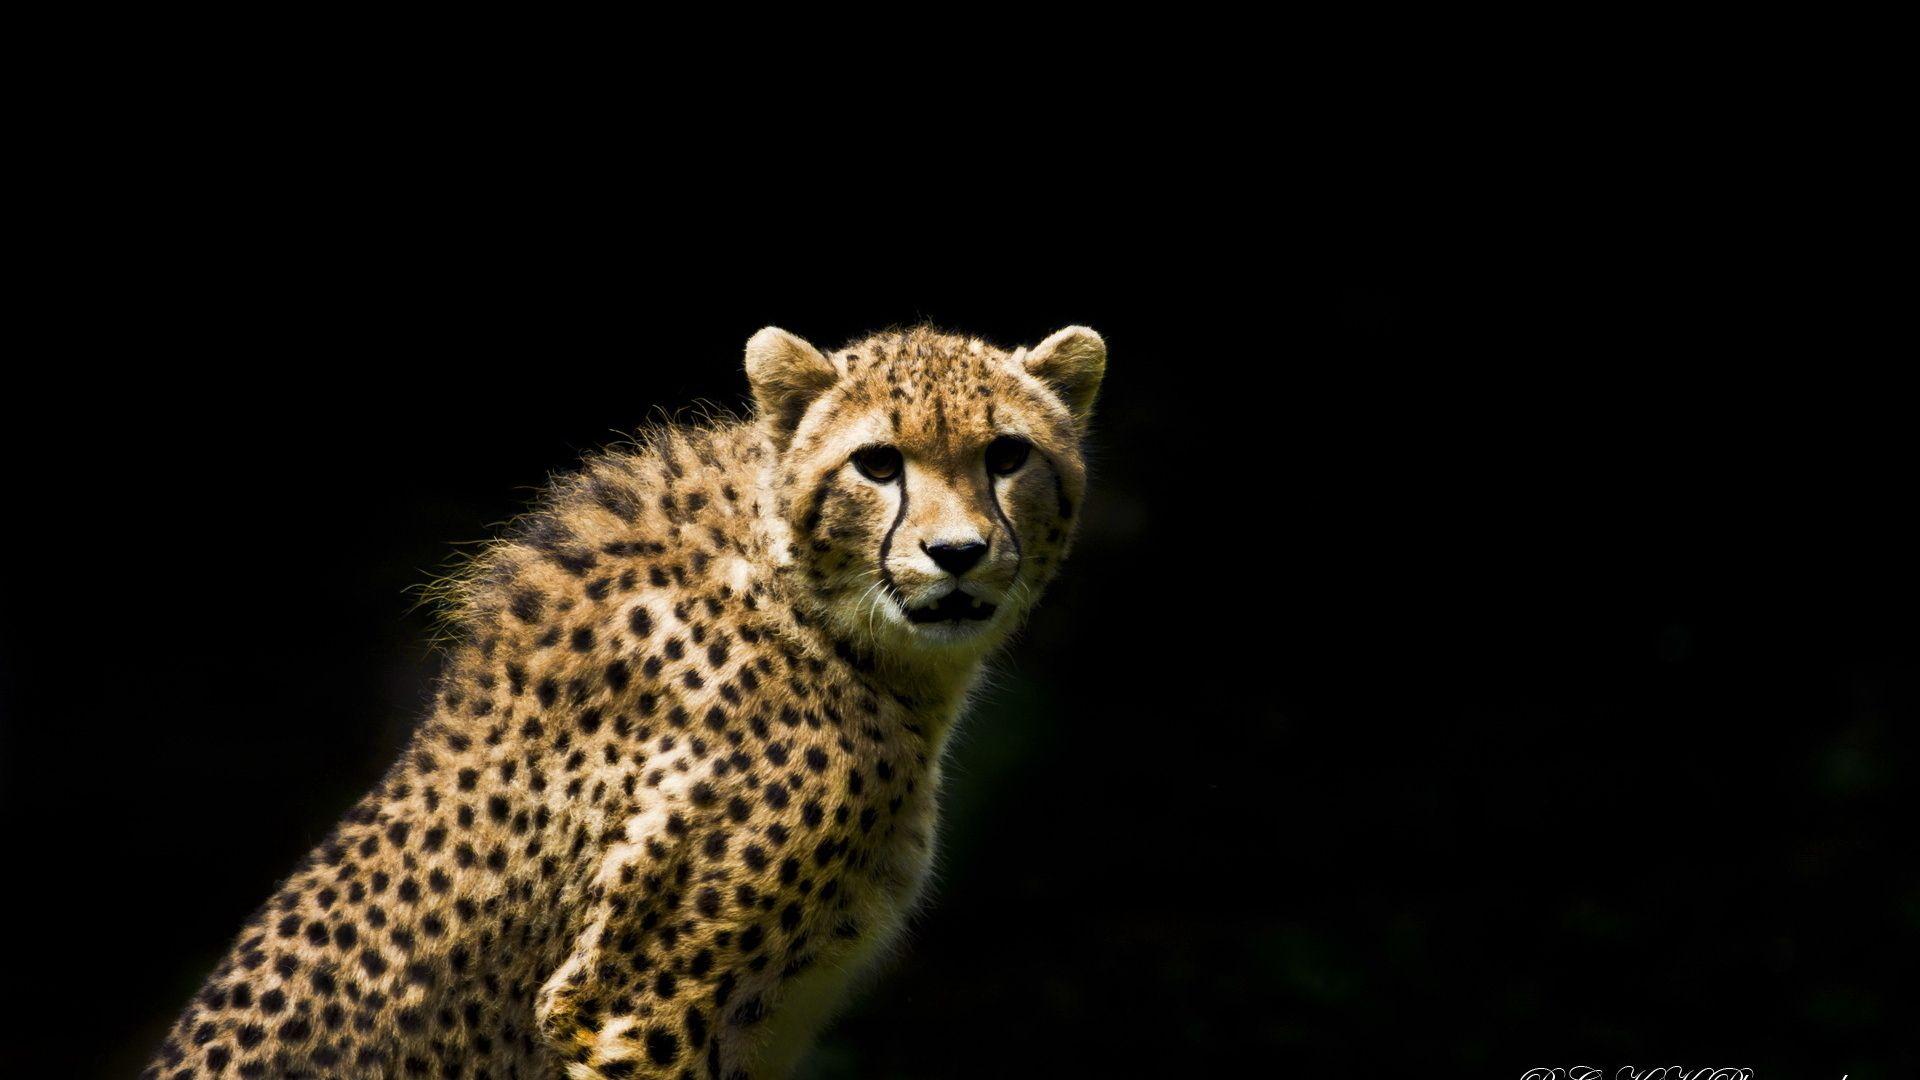 Download Wallpapers For Cheetah, Eyes, Predator